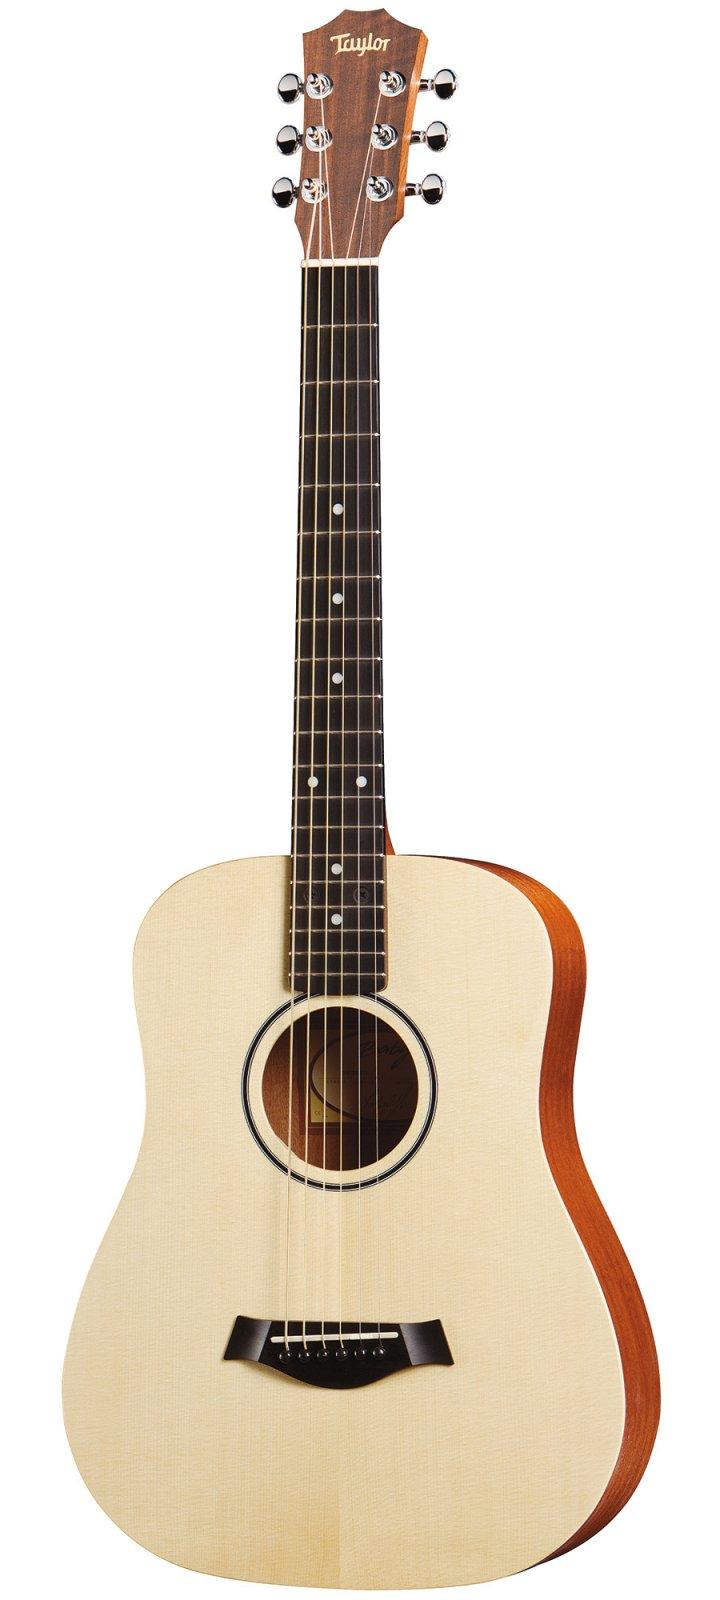 Taylor BT-1 Left Handed Baby Taylor Guitar with Gig Bag